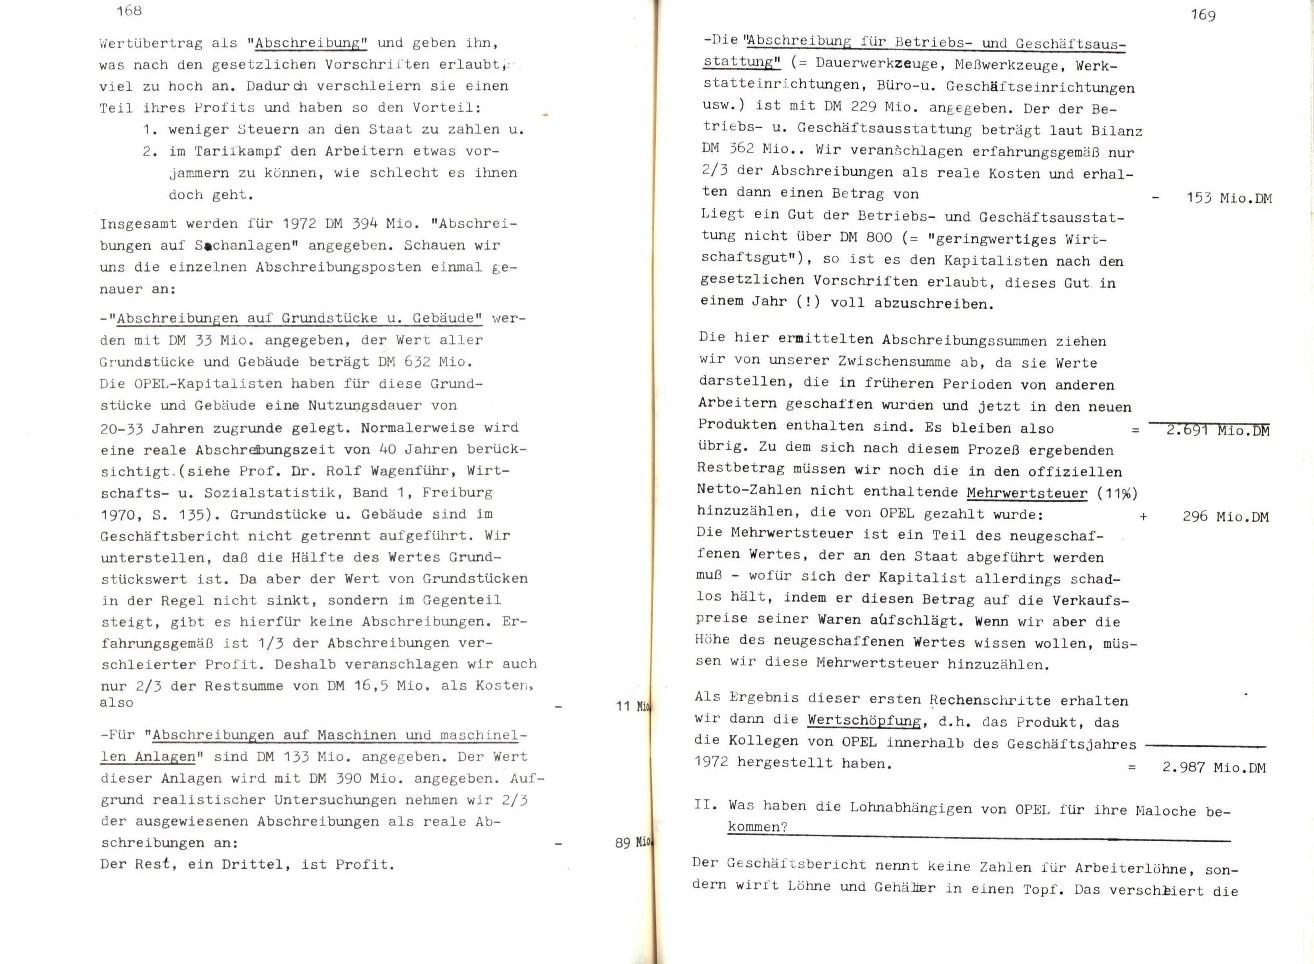 Bochum_IGM_Opel_PG_Opel_streikt_1973_087